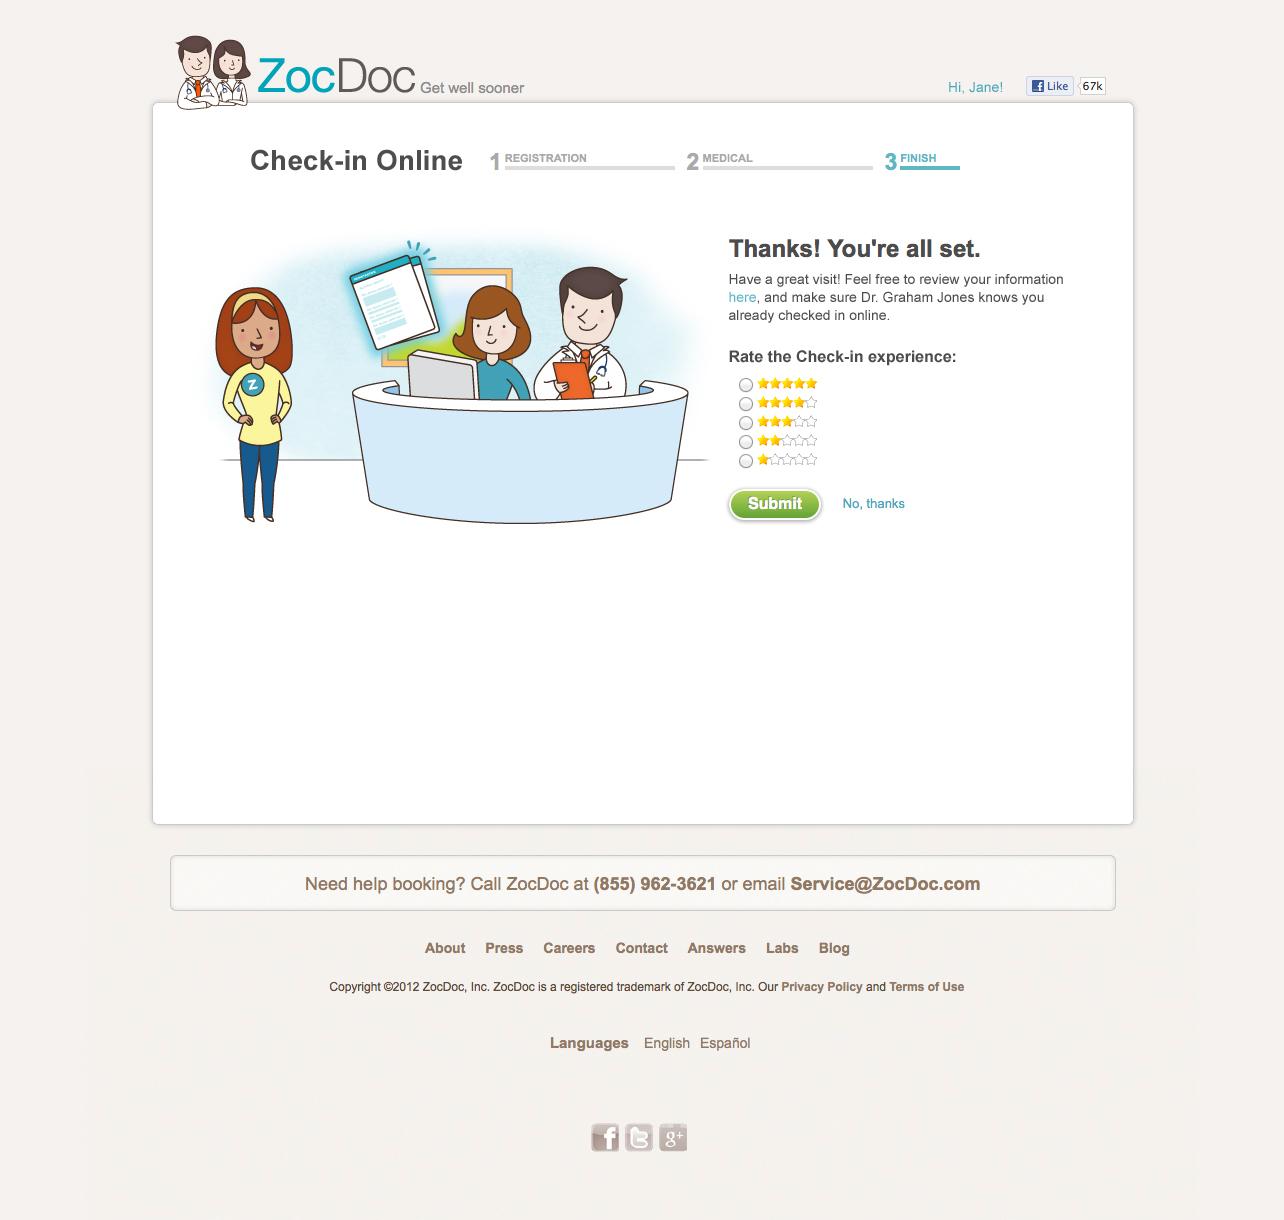 ZocDoc Check-In